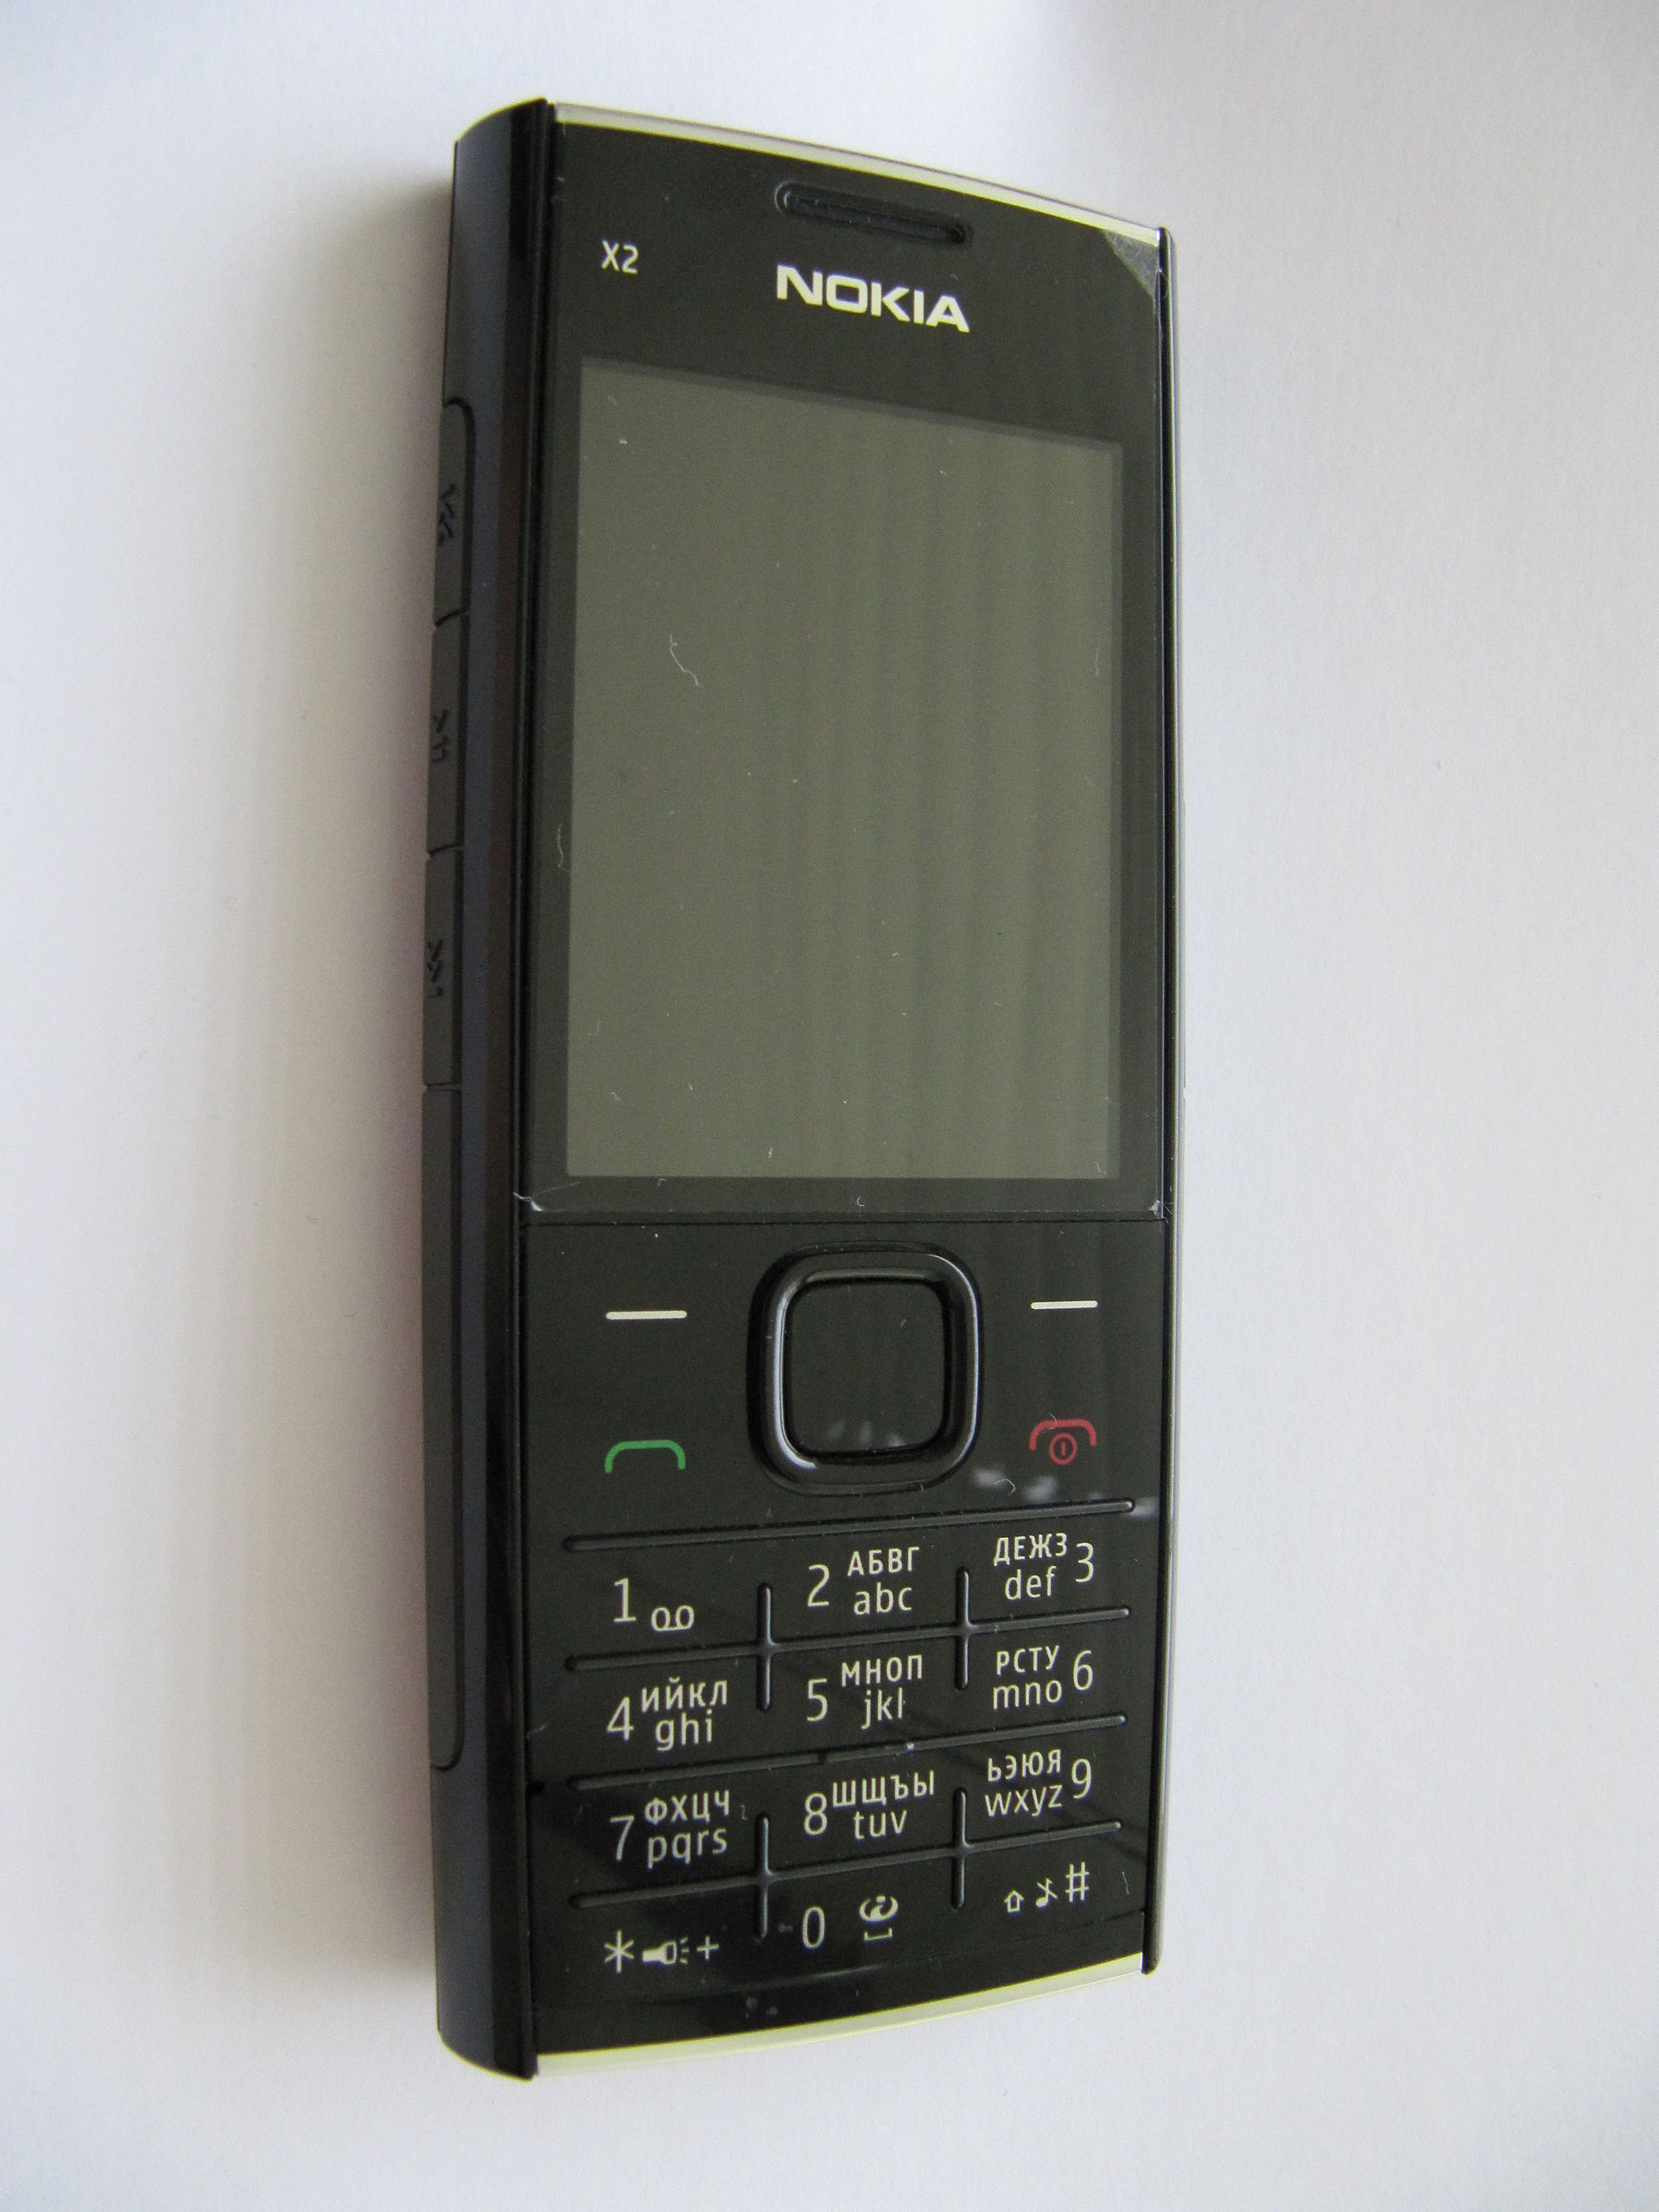 Nokia X2 00 Wikipedia La Enciclopedia Libre